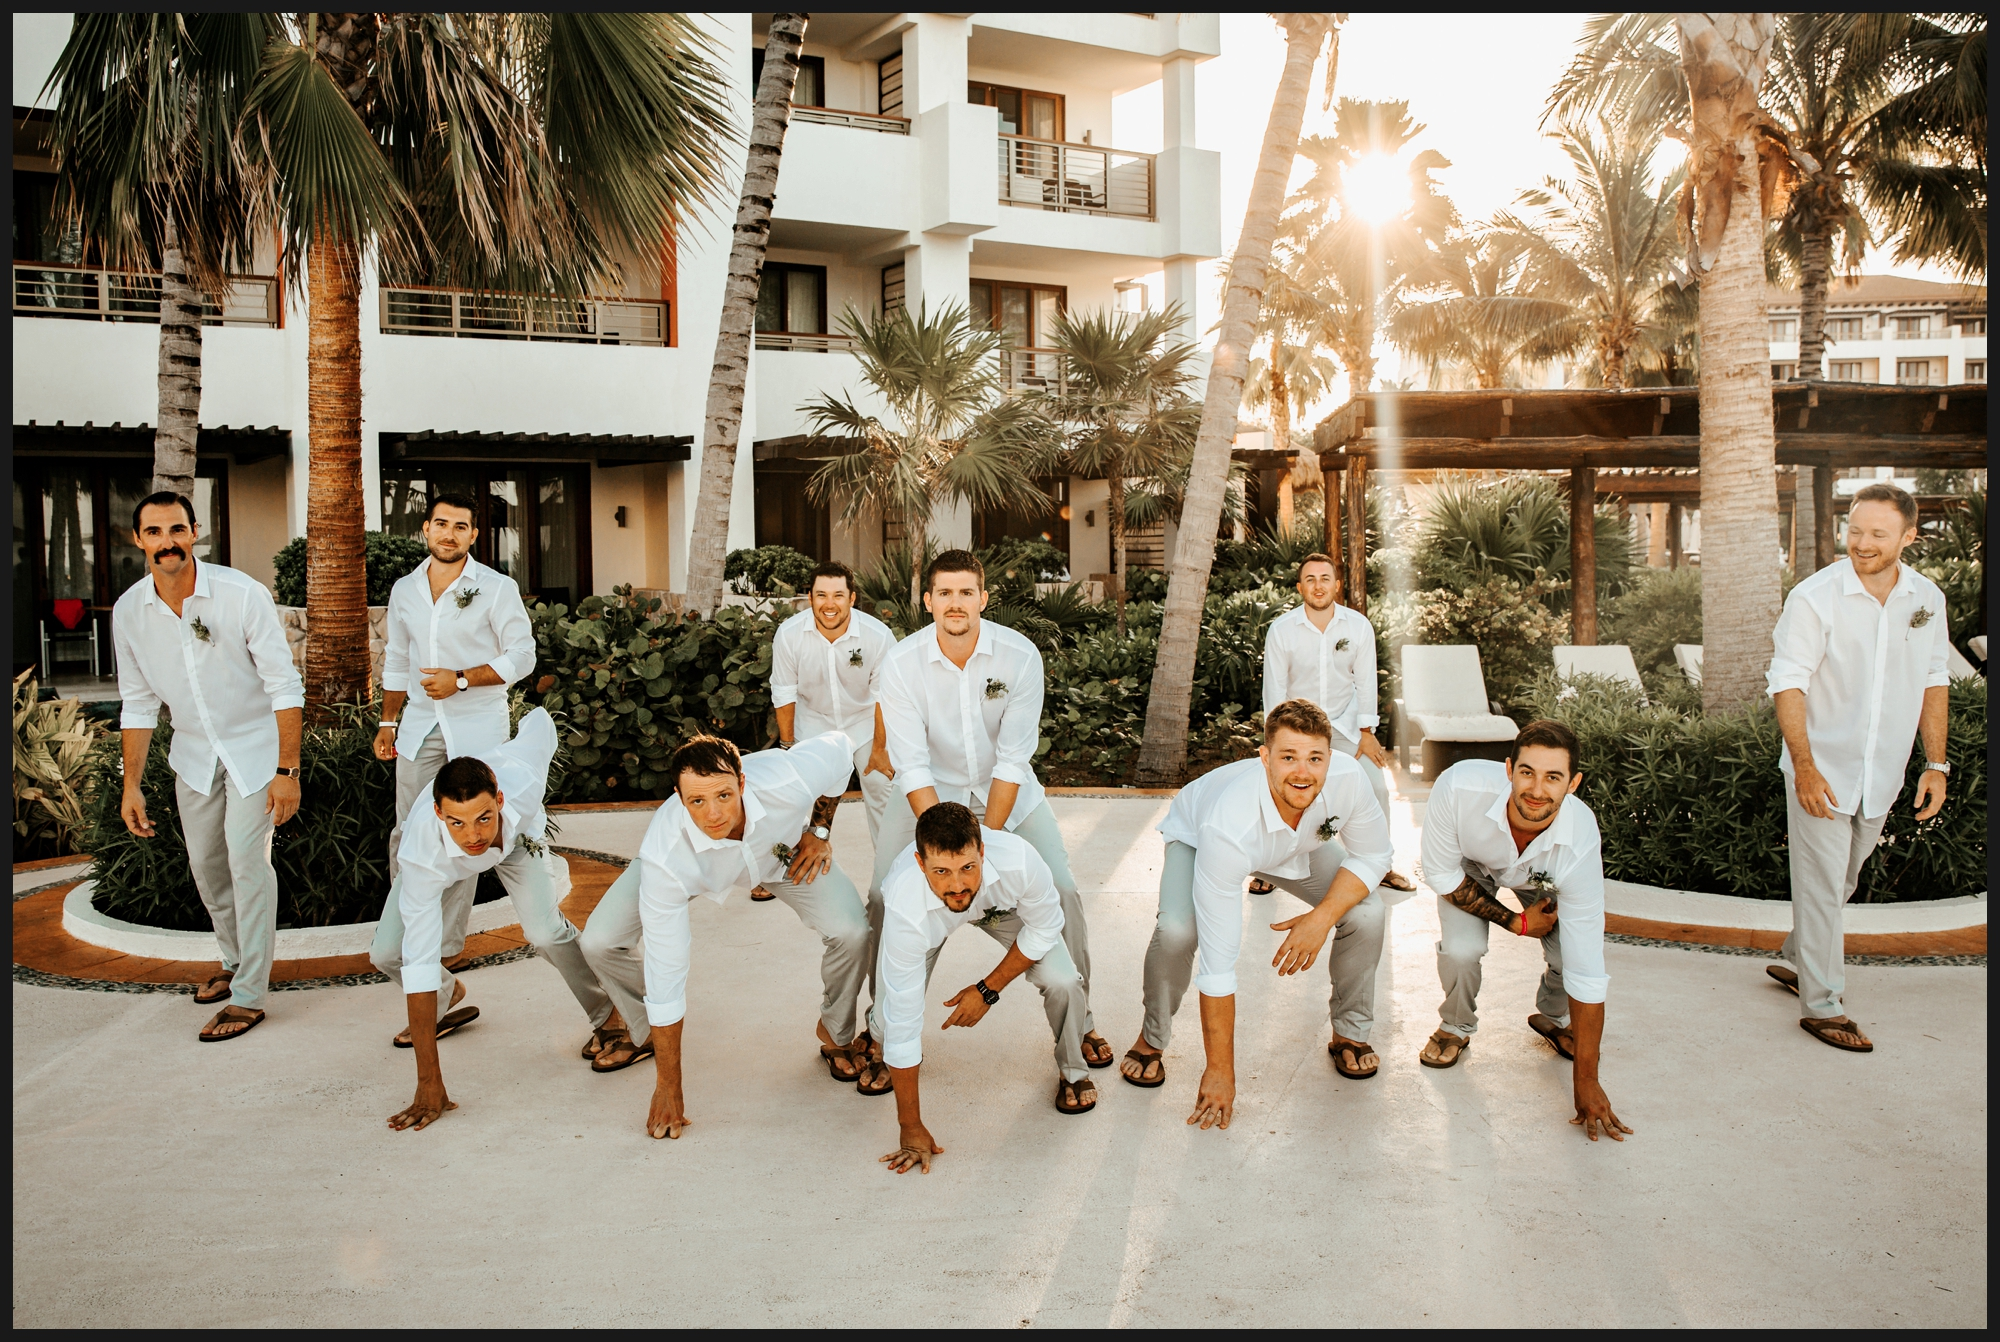 Orlando-Wedding-Photographer-destination-wedding-photographer-florida-wedding-photographer-bohemian-wedding-photographer_0518.jpg